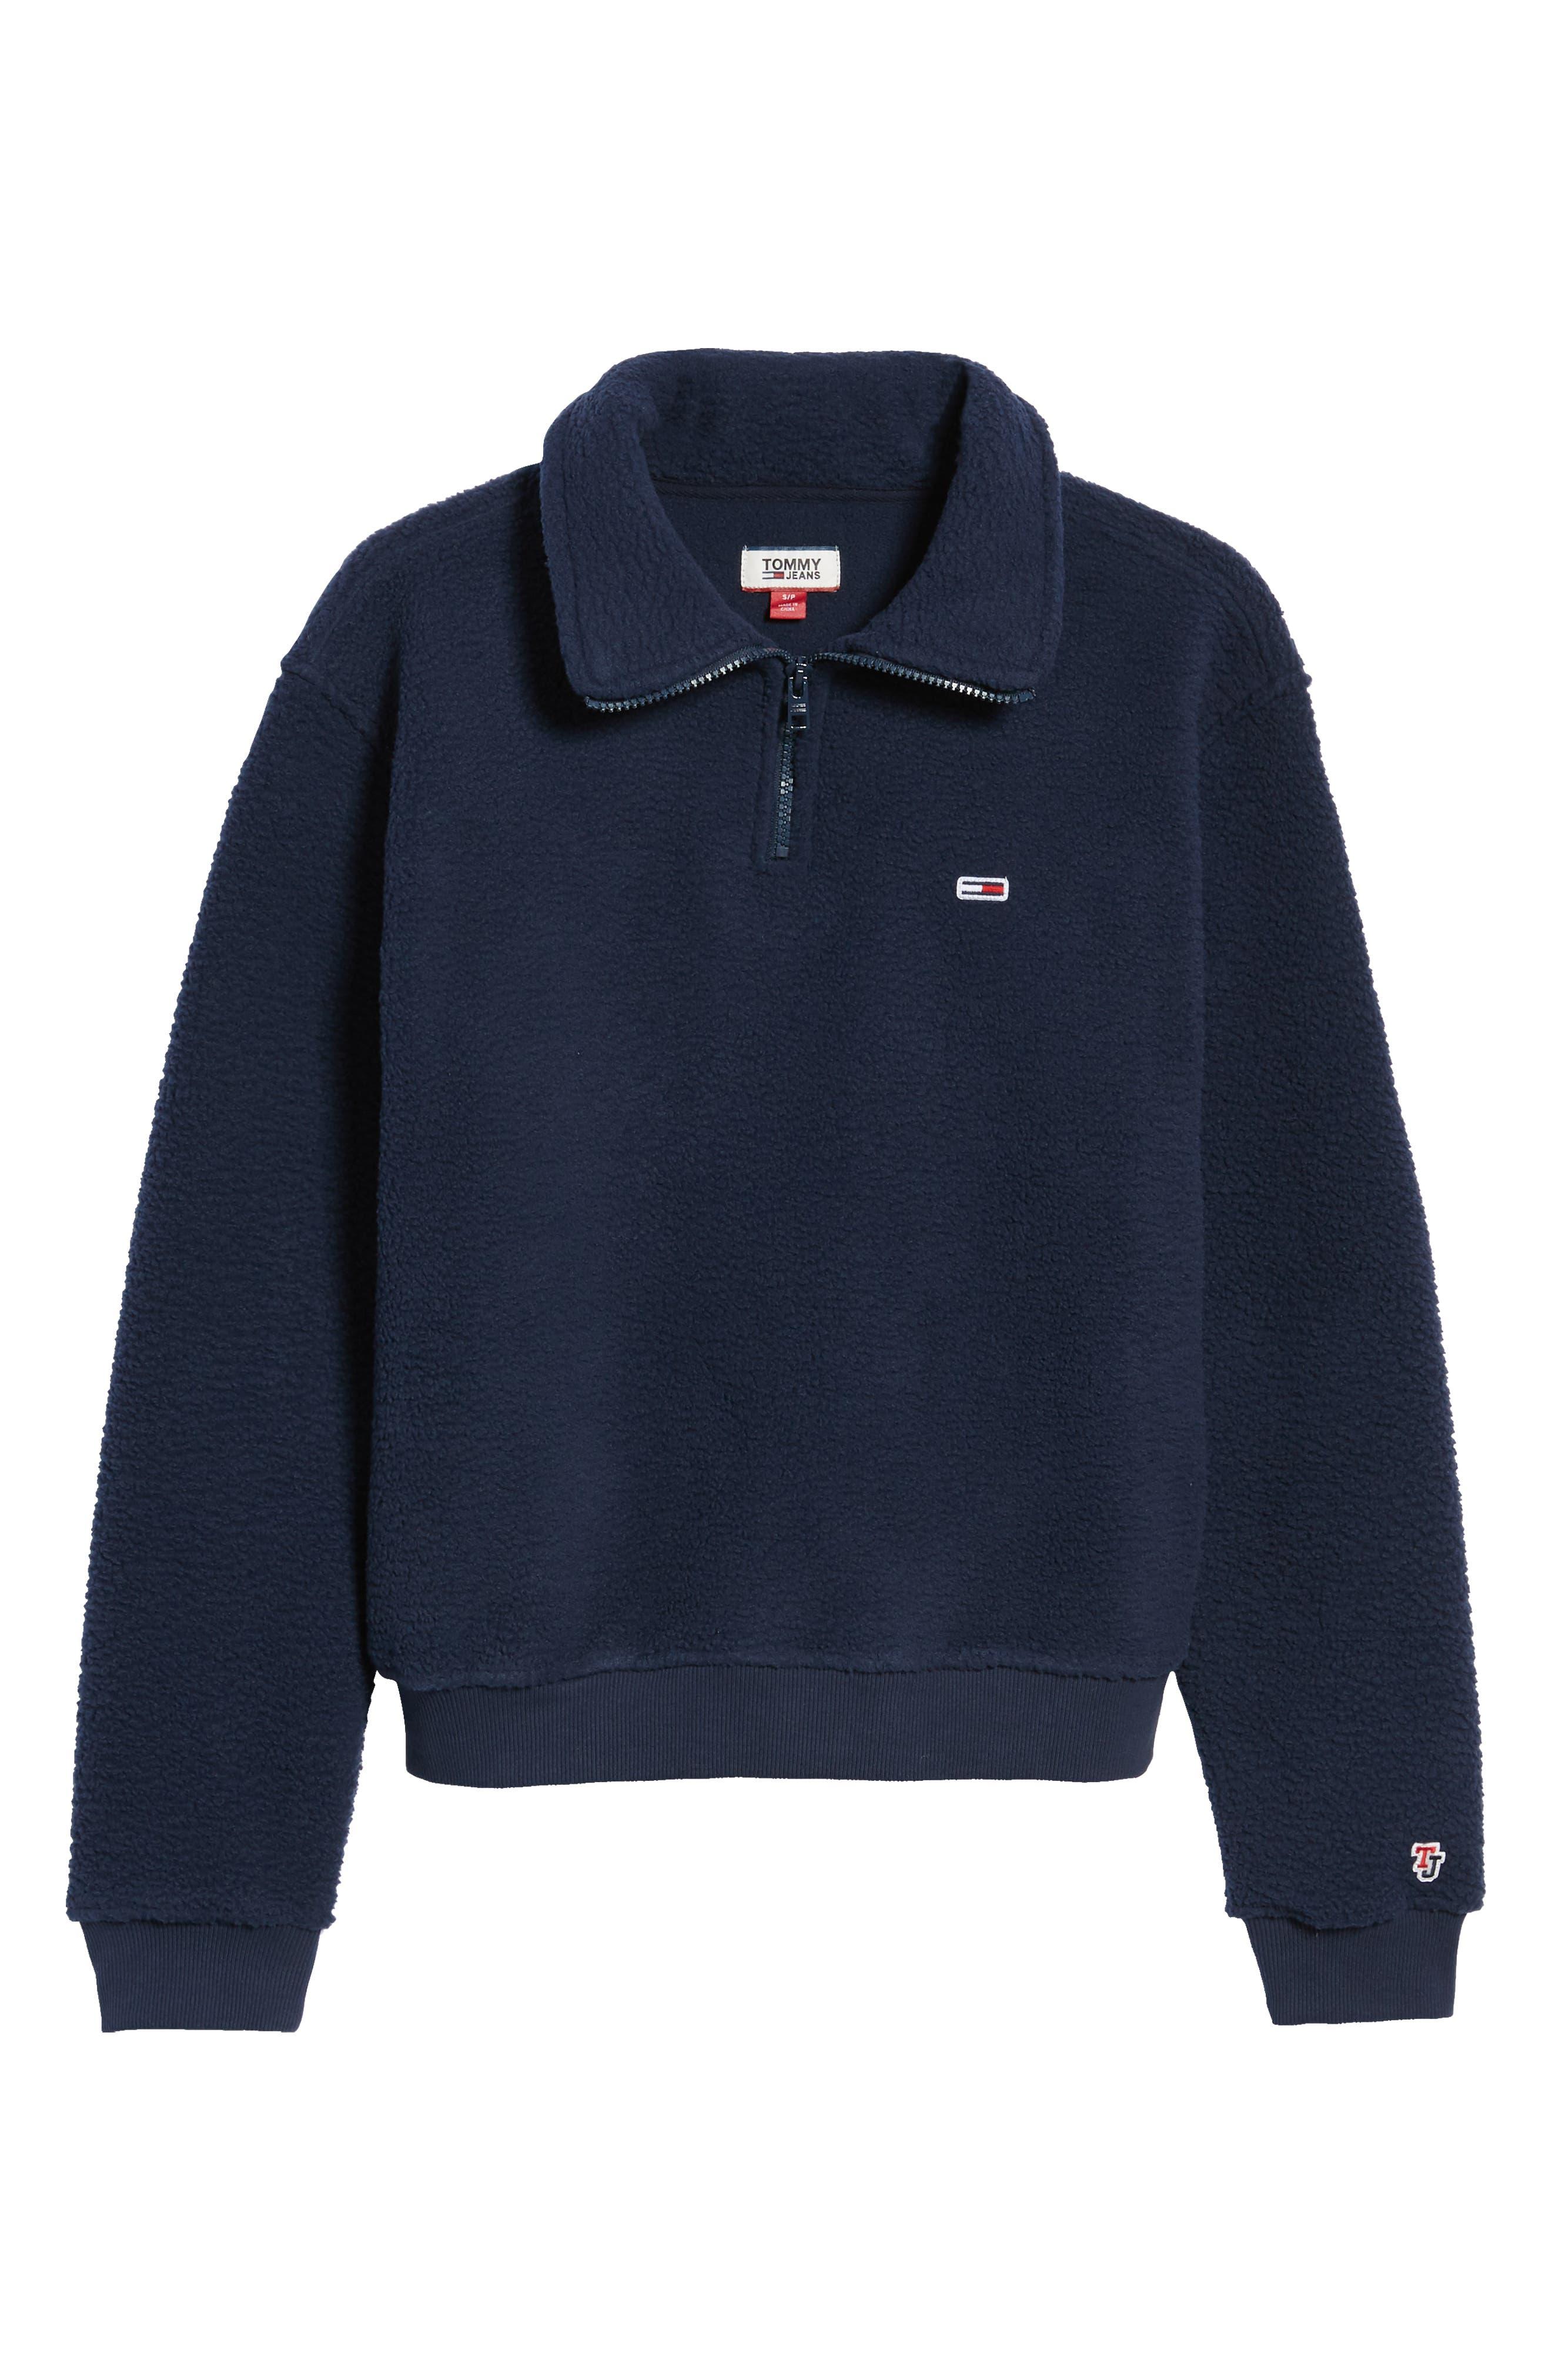 TJW Classics Polar Fleece Sweatshirt,                             Alternate thumbnail 6, color,                             002